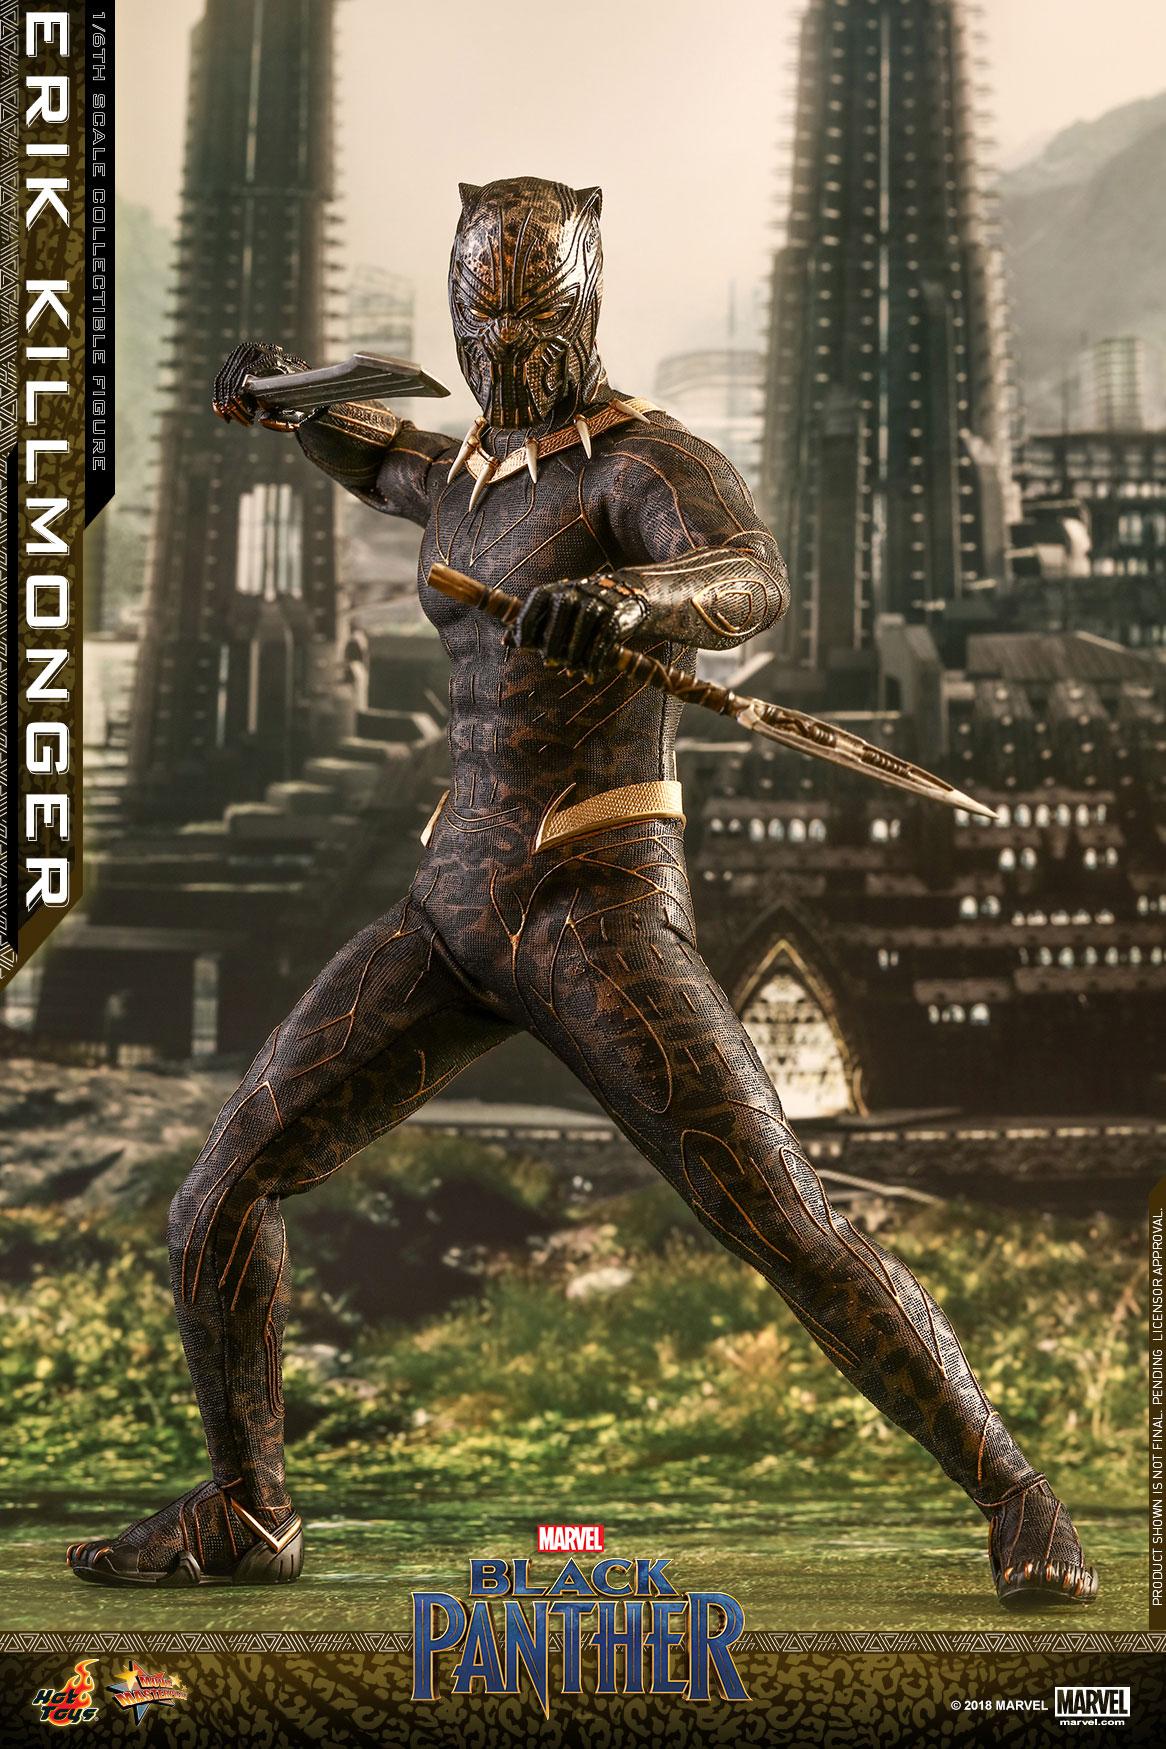 Hot-Toys---Black-Panther---Erik-Killmonger-collectible-figure_PR1